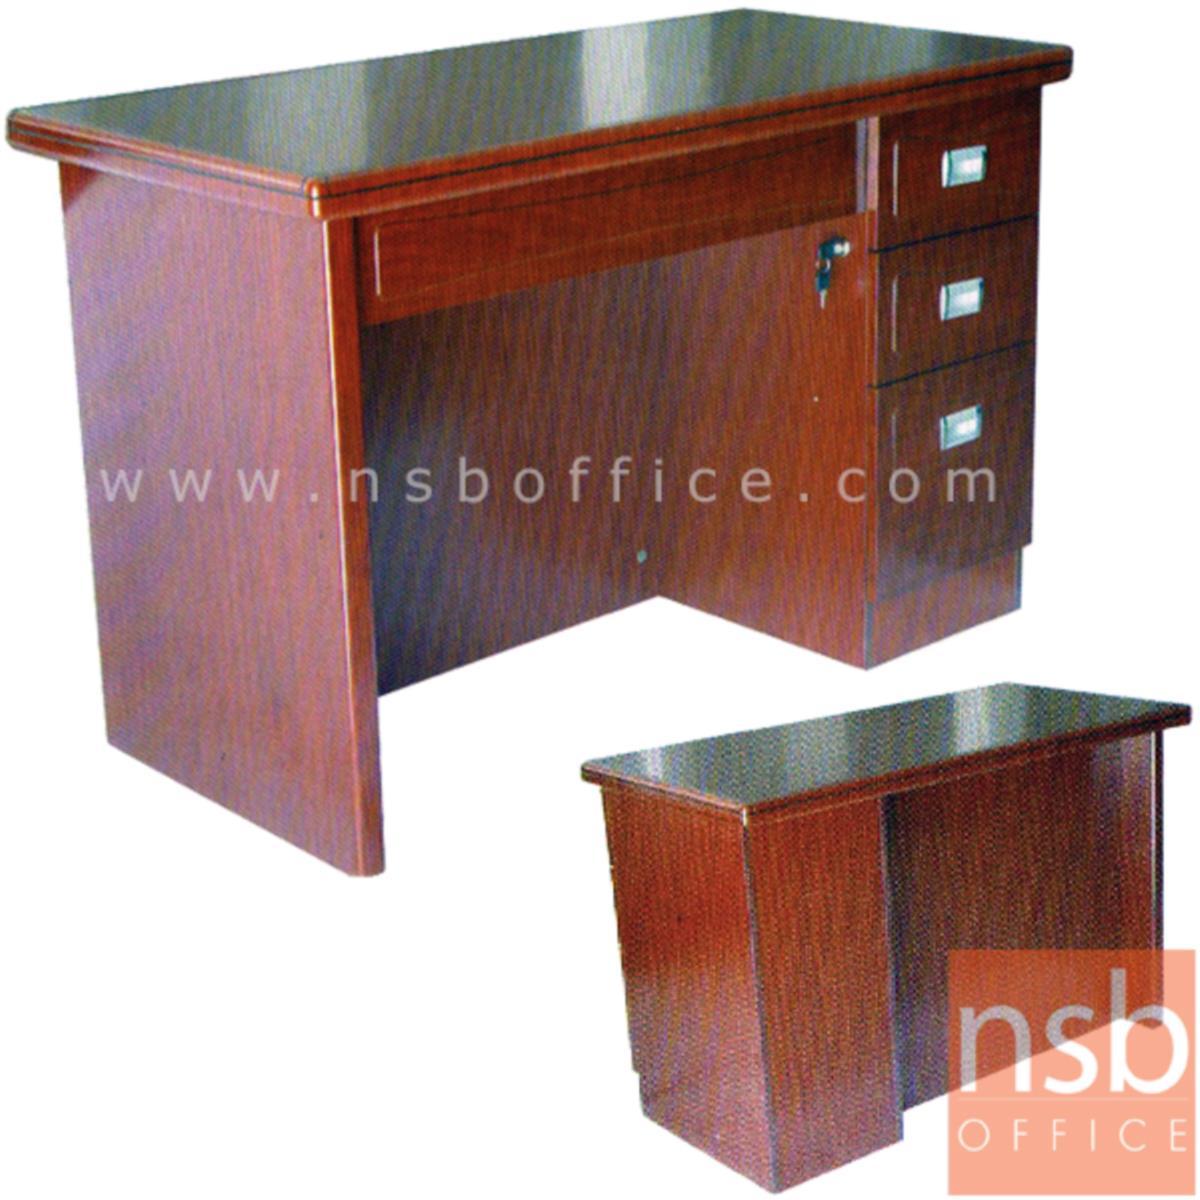 A06A116:โต๊ะผู้บริหารทรงตรง 4 ลิ้นชัก รุ่น Garland (การ์แลนด์) ขนาด 120W cm. พร้อมกุญแจล็อค